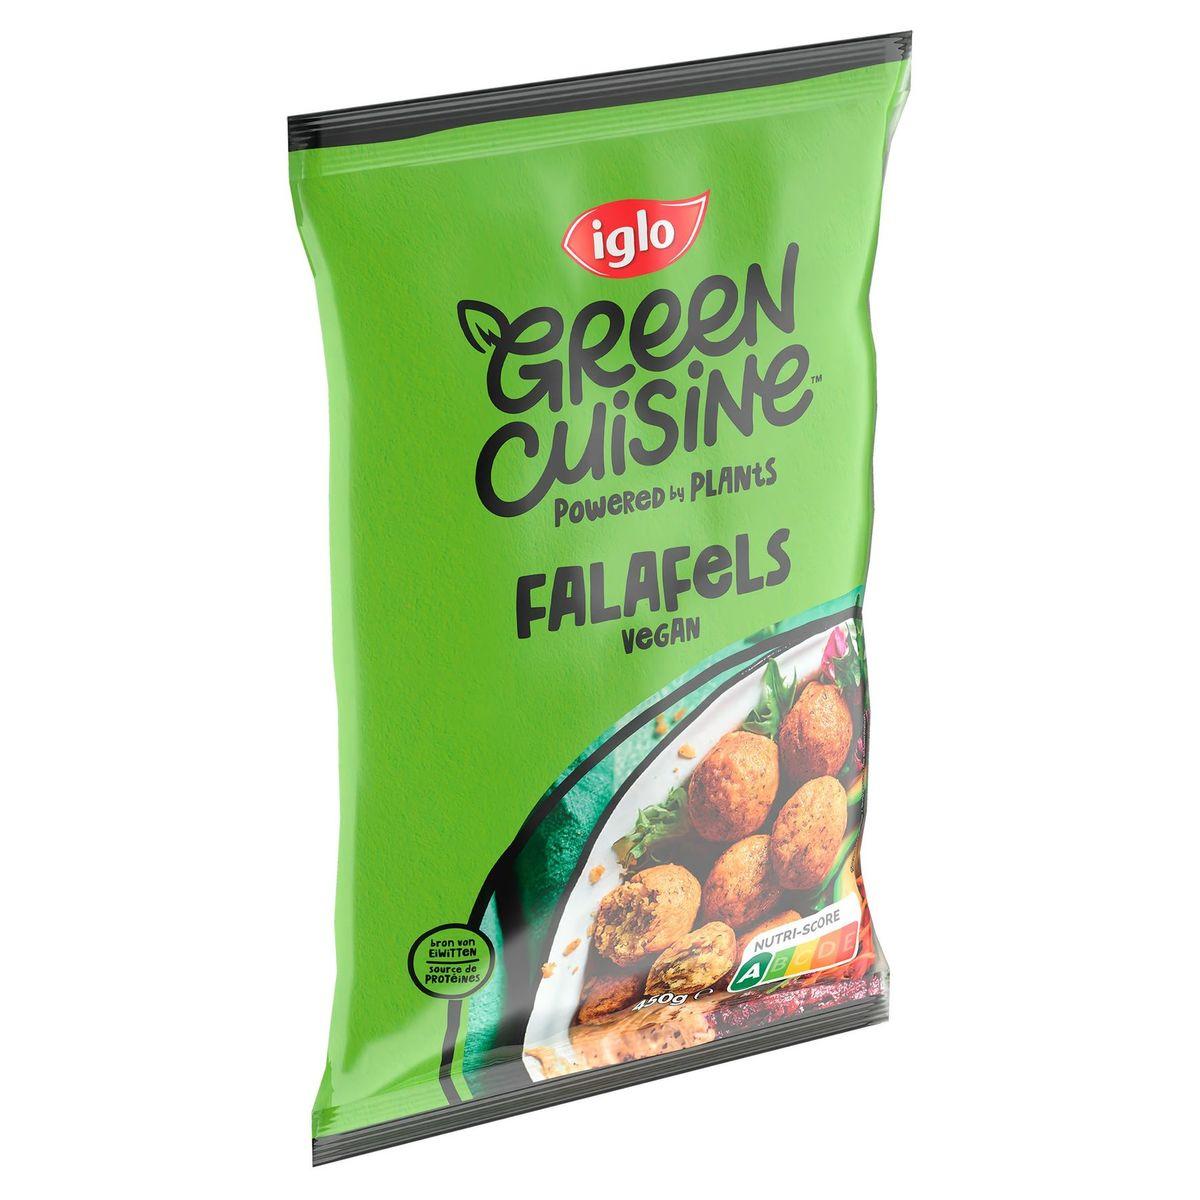 Iglo Green Cuisine Falafel 450g